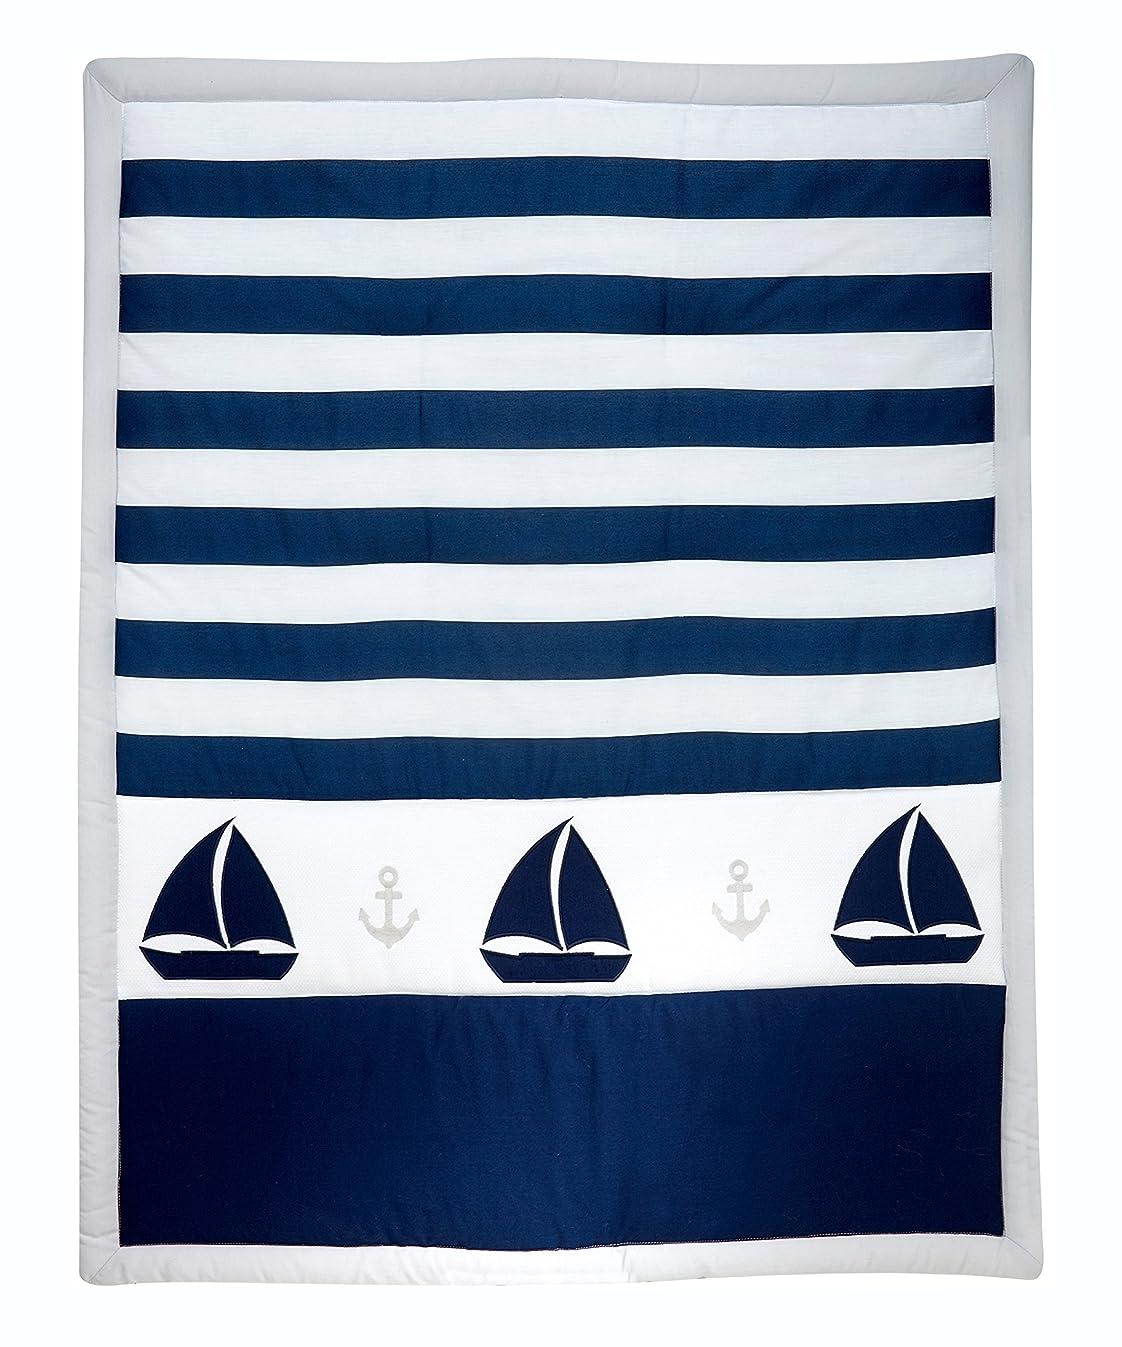 Nautica Kids Nursery Separates Comforter, Navy/Grey/White